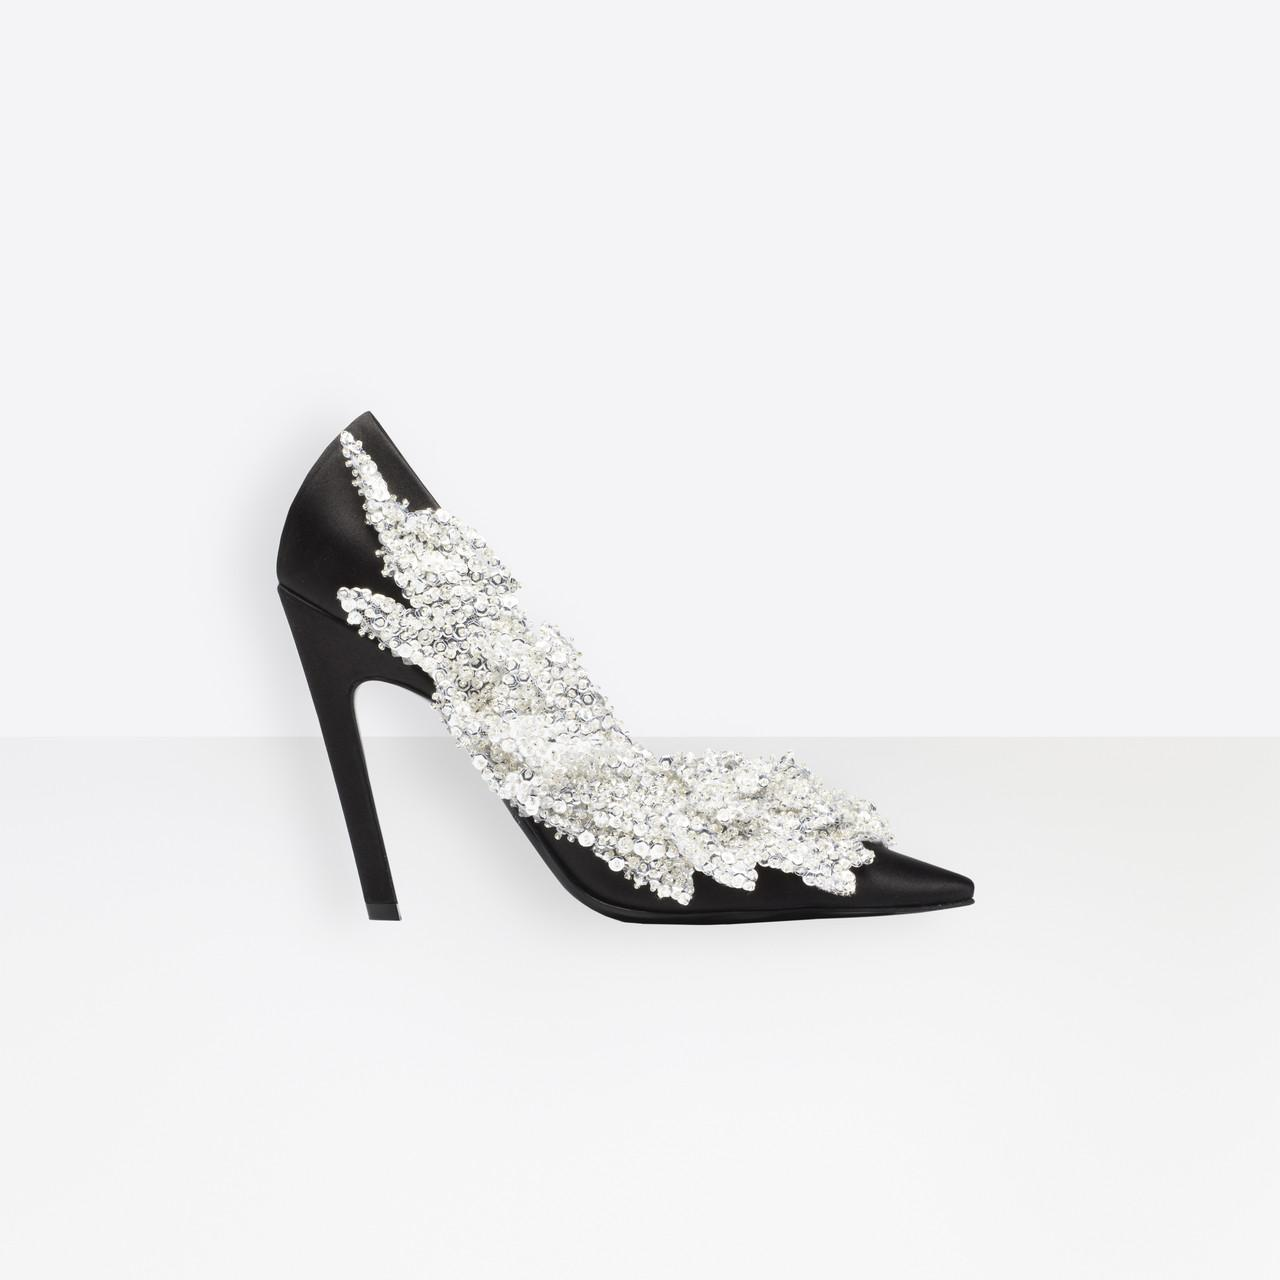 8f613c3e0c6 Lyst - Balenciaga Slash Heel Pumps in Black